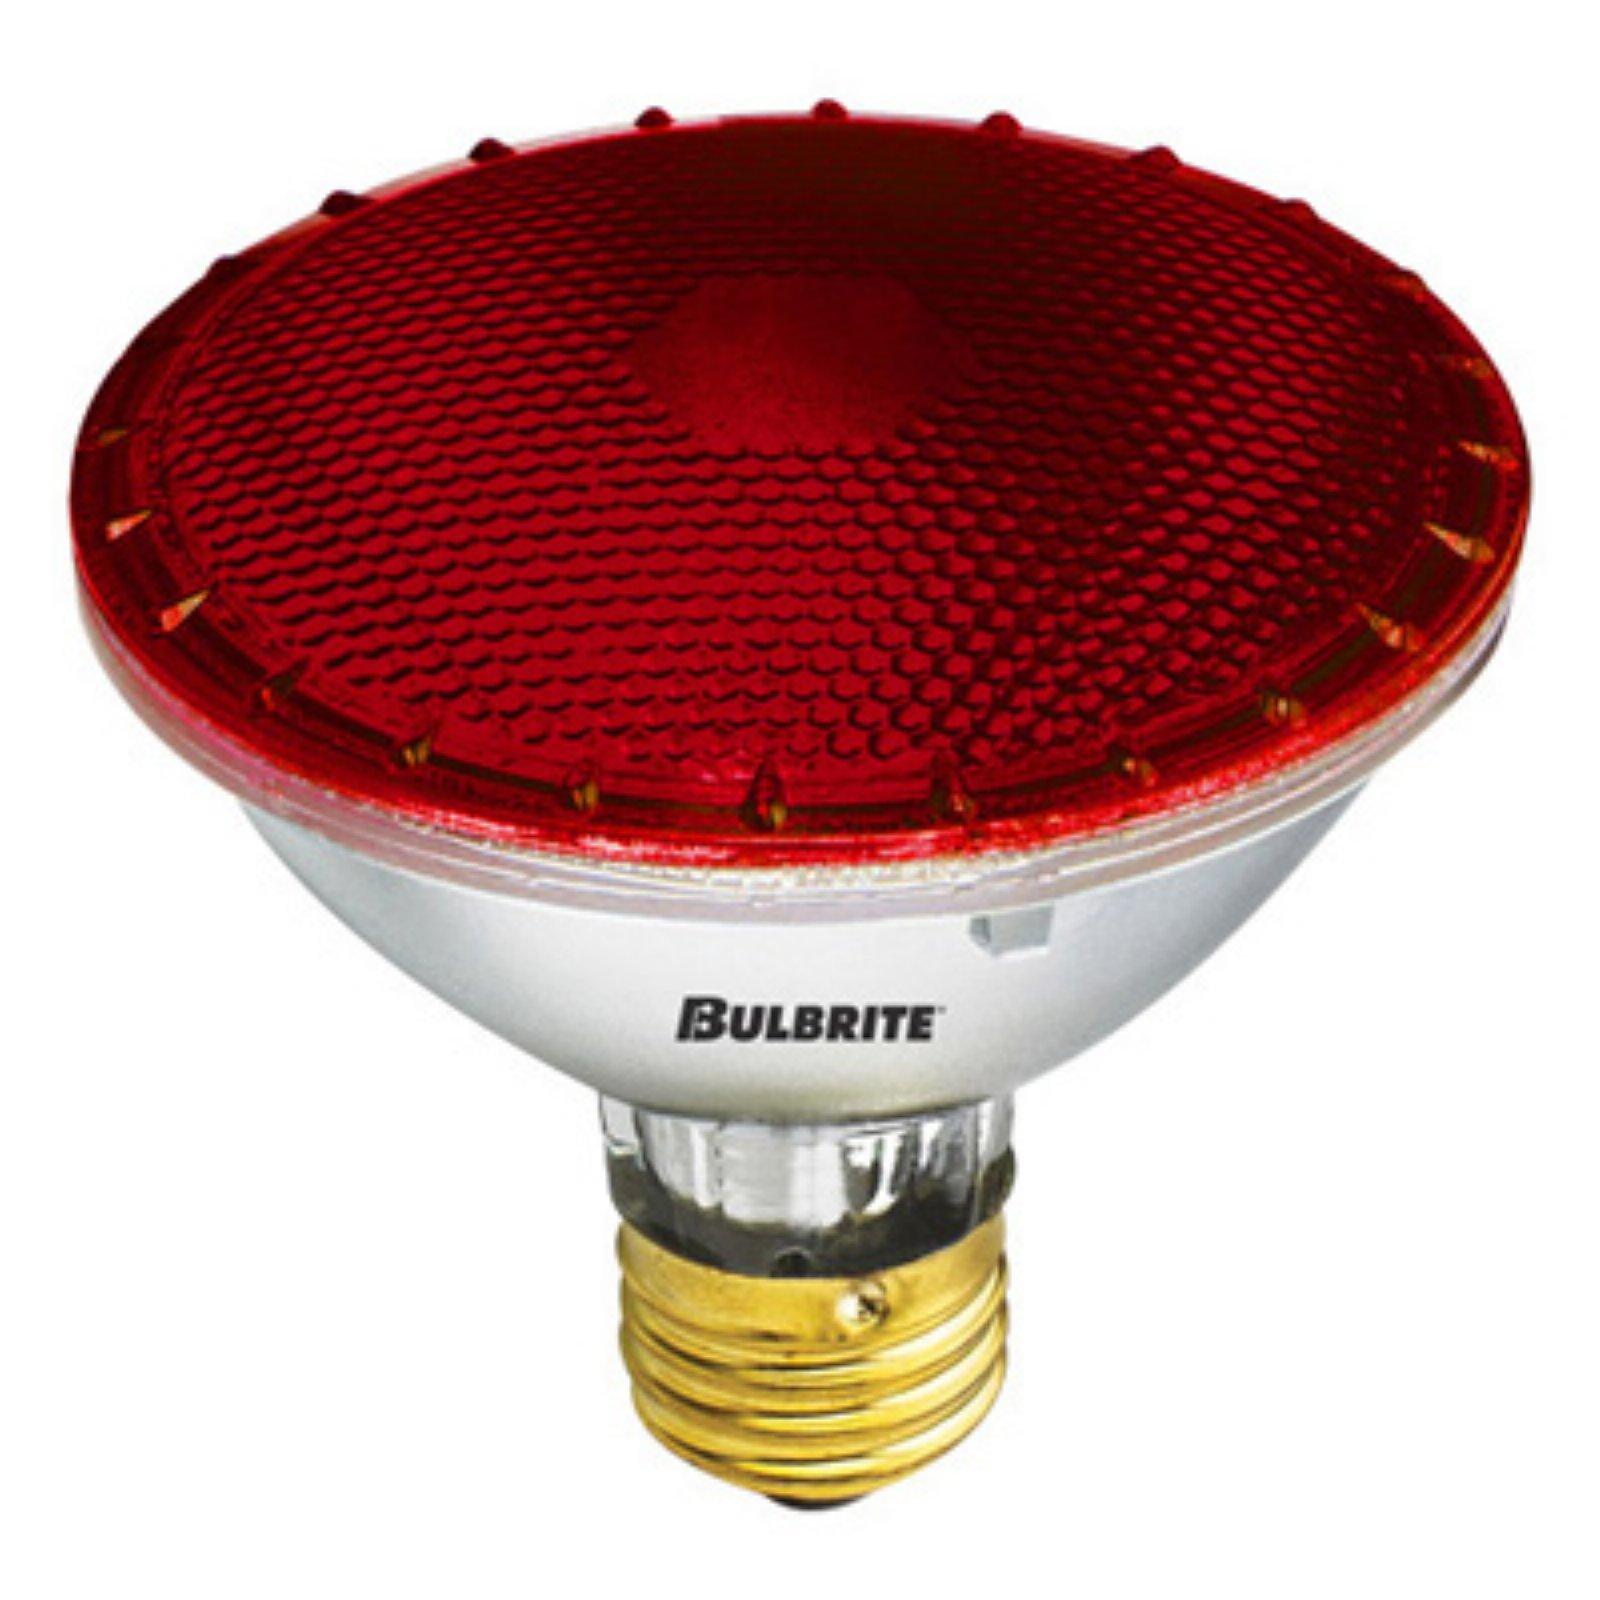 GU10 Base Flood Light 634075 4 Pack Bulbrite 75R111GU//FL 75-Watt Halogen R111 Reflector